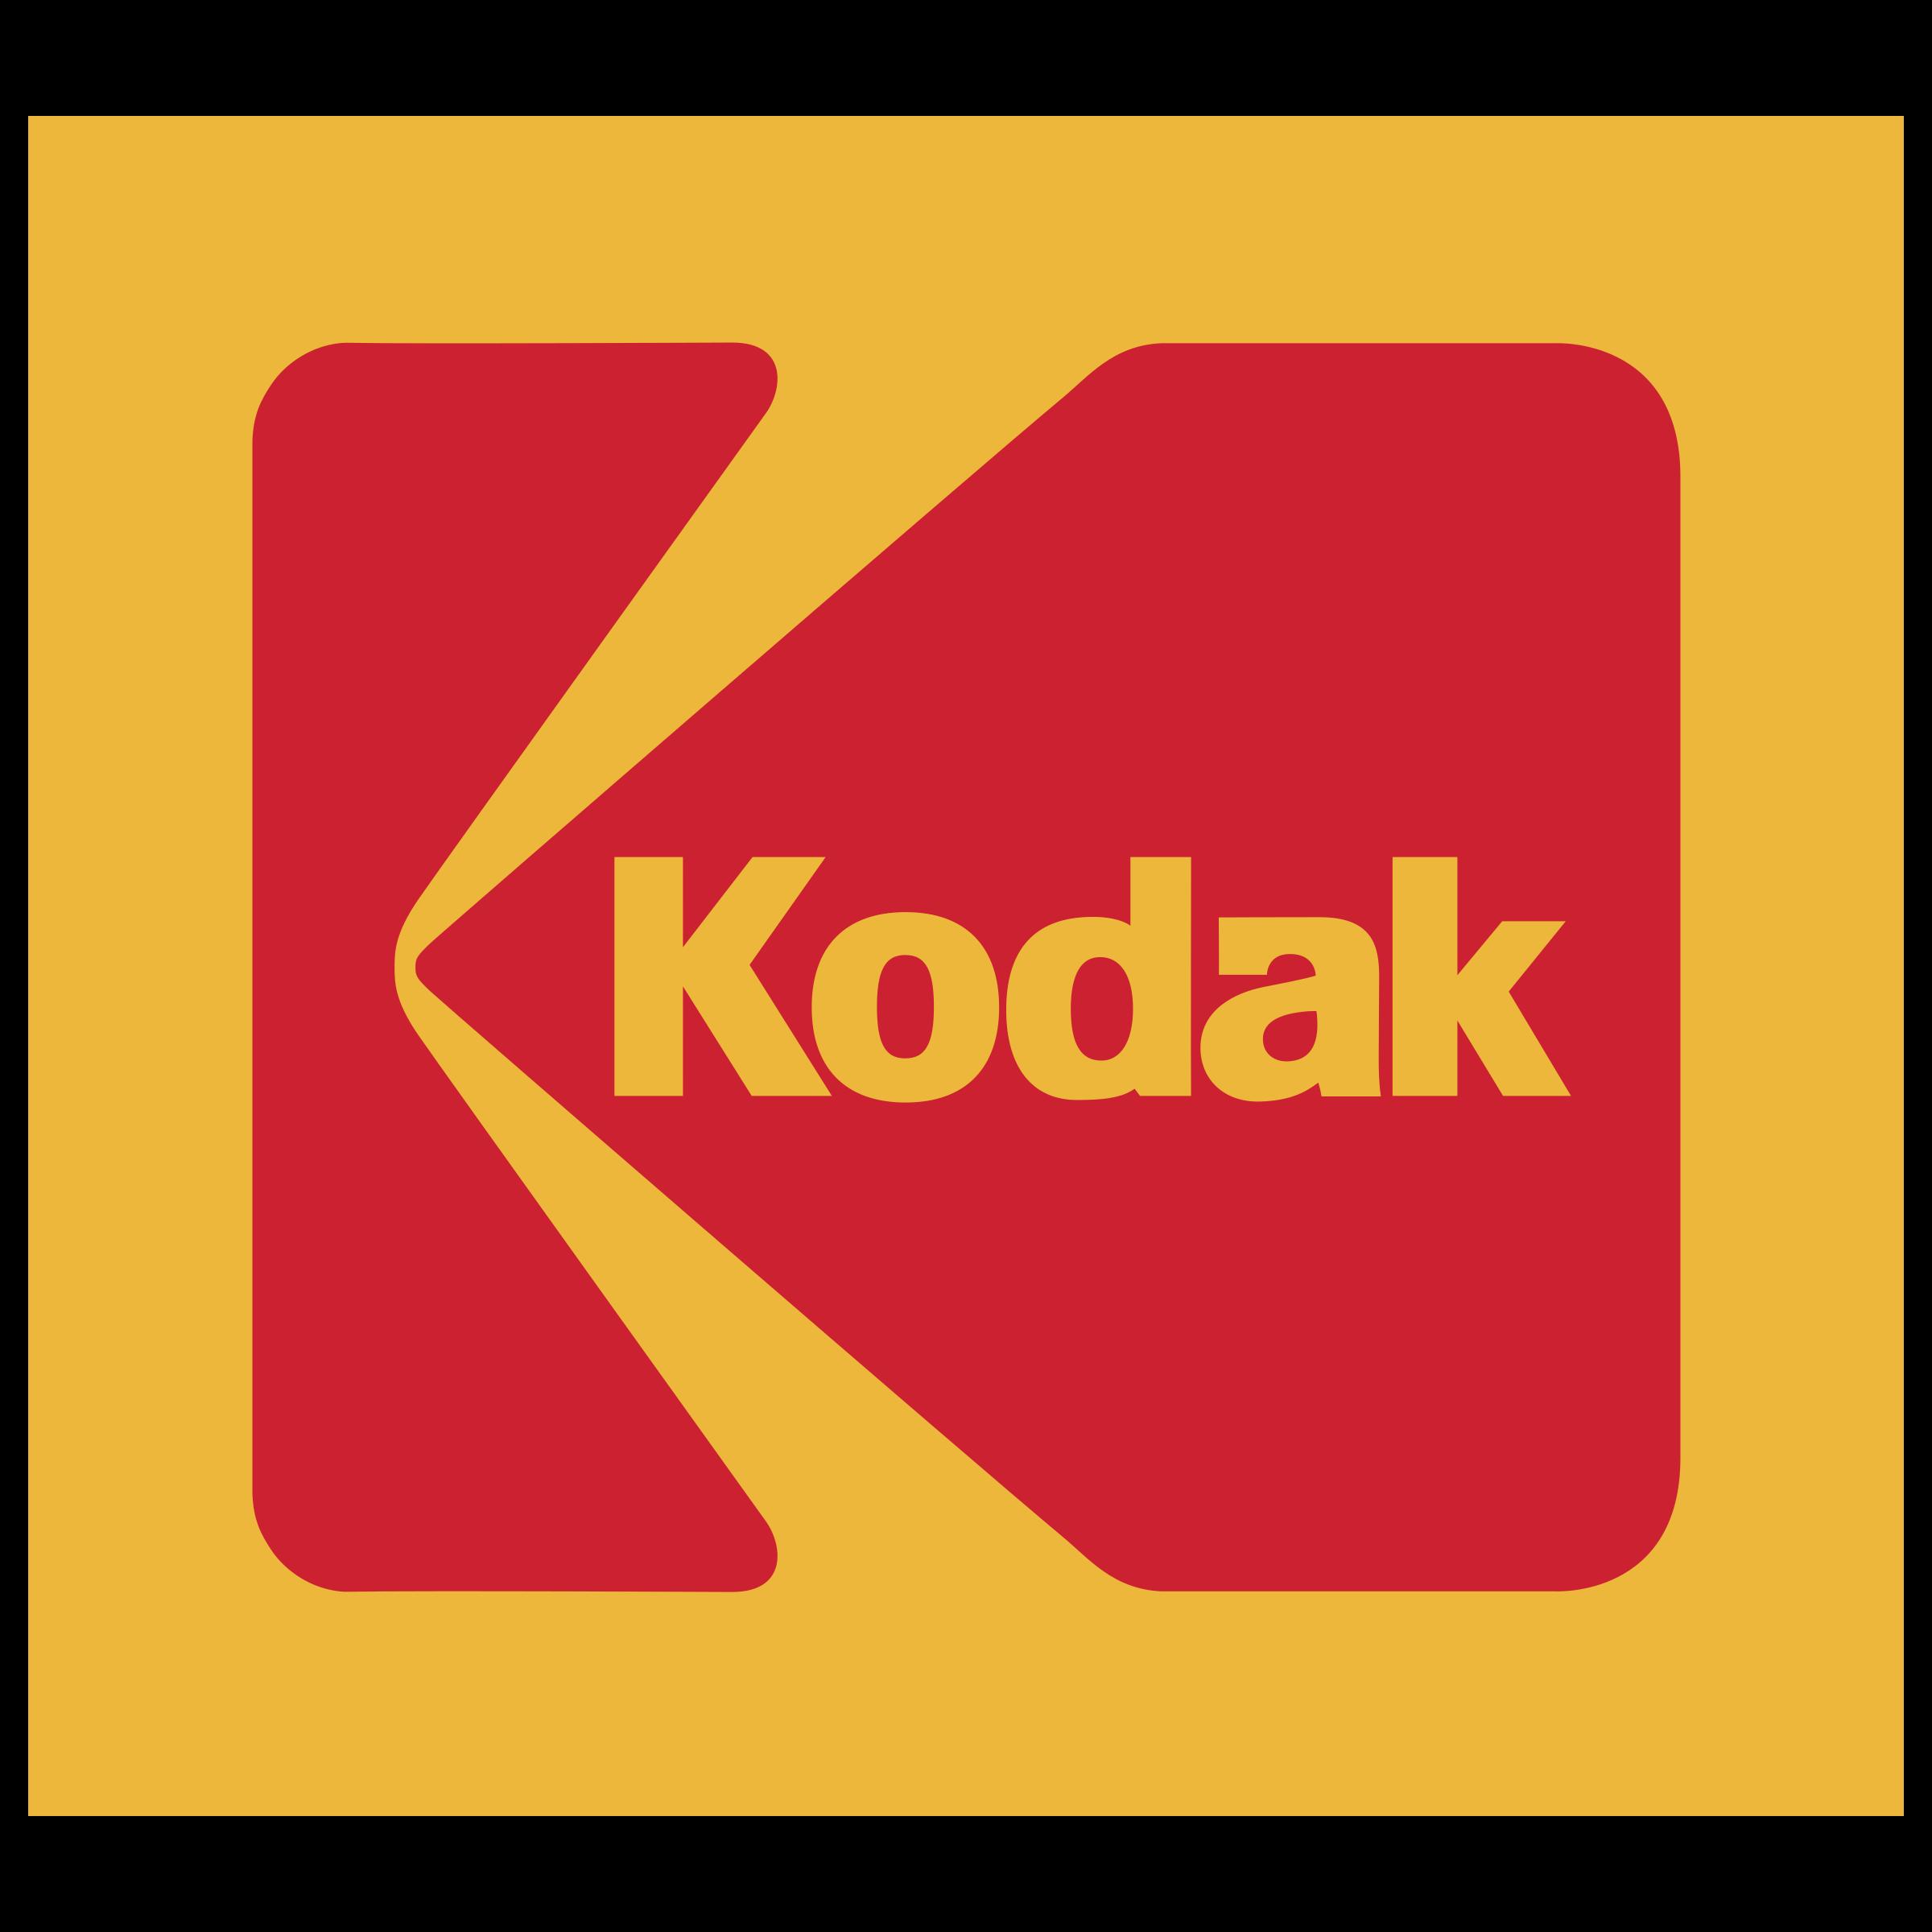 Kodak Logo PNG Transparent & SVG Vector.